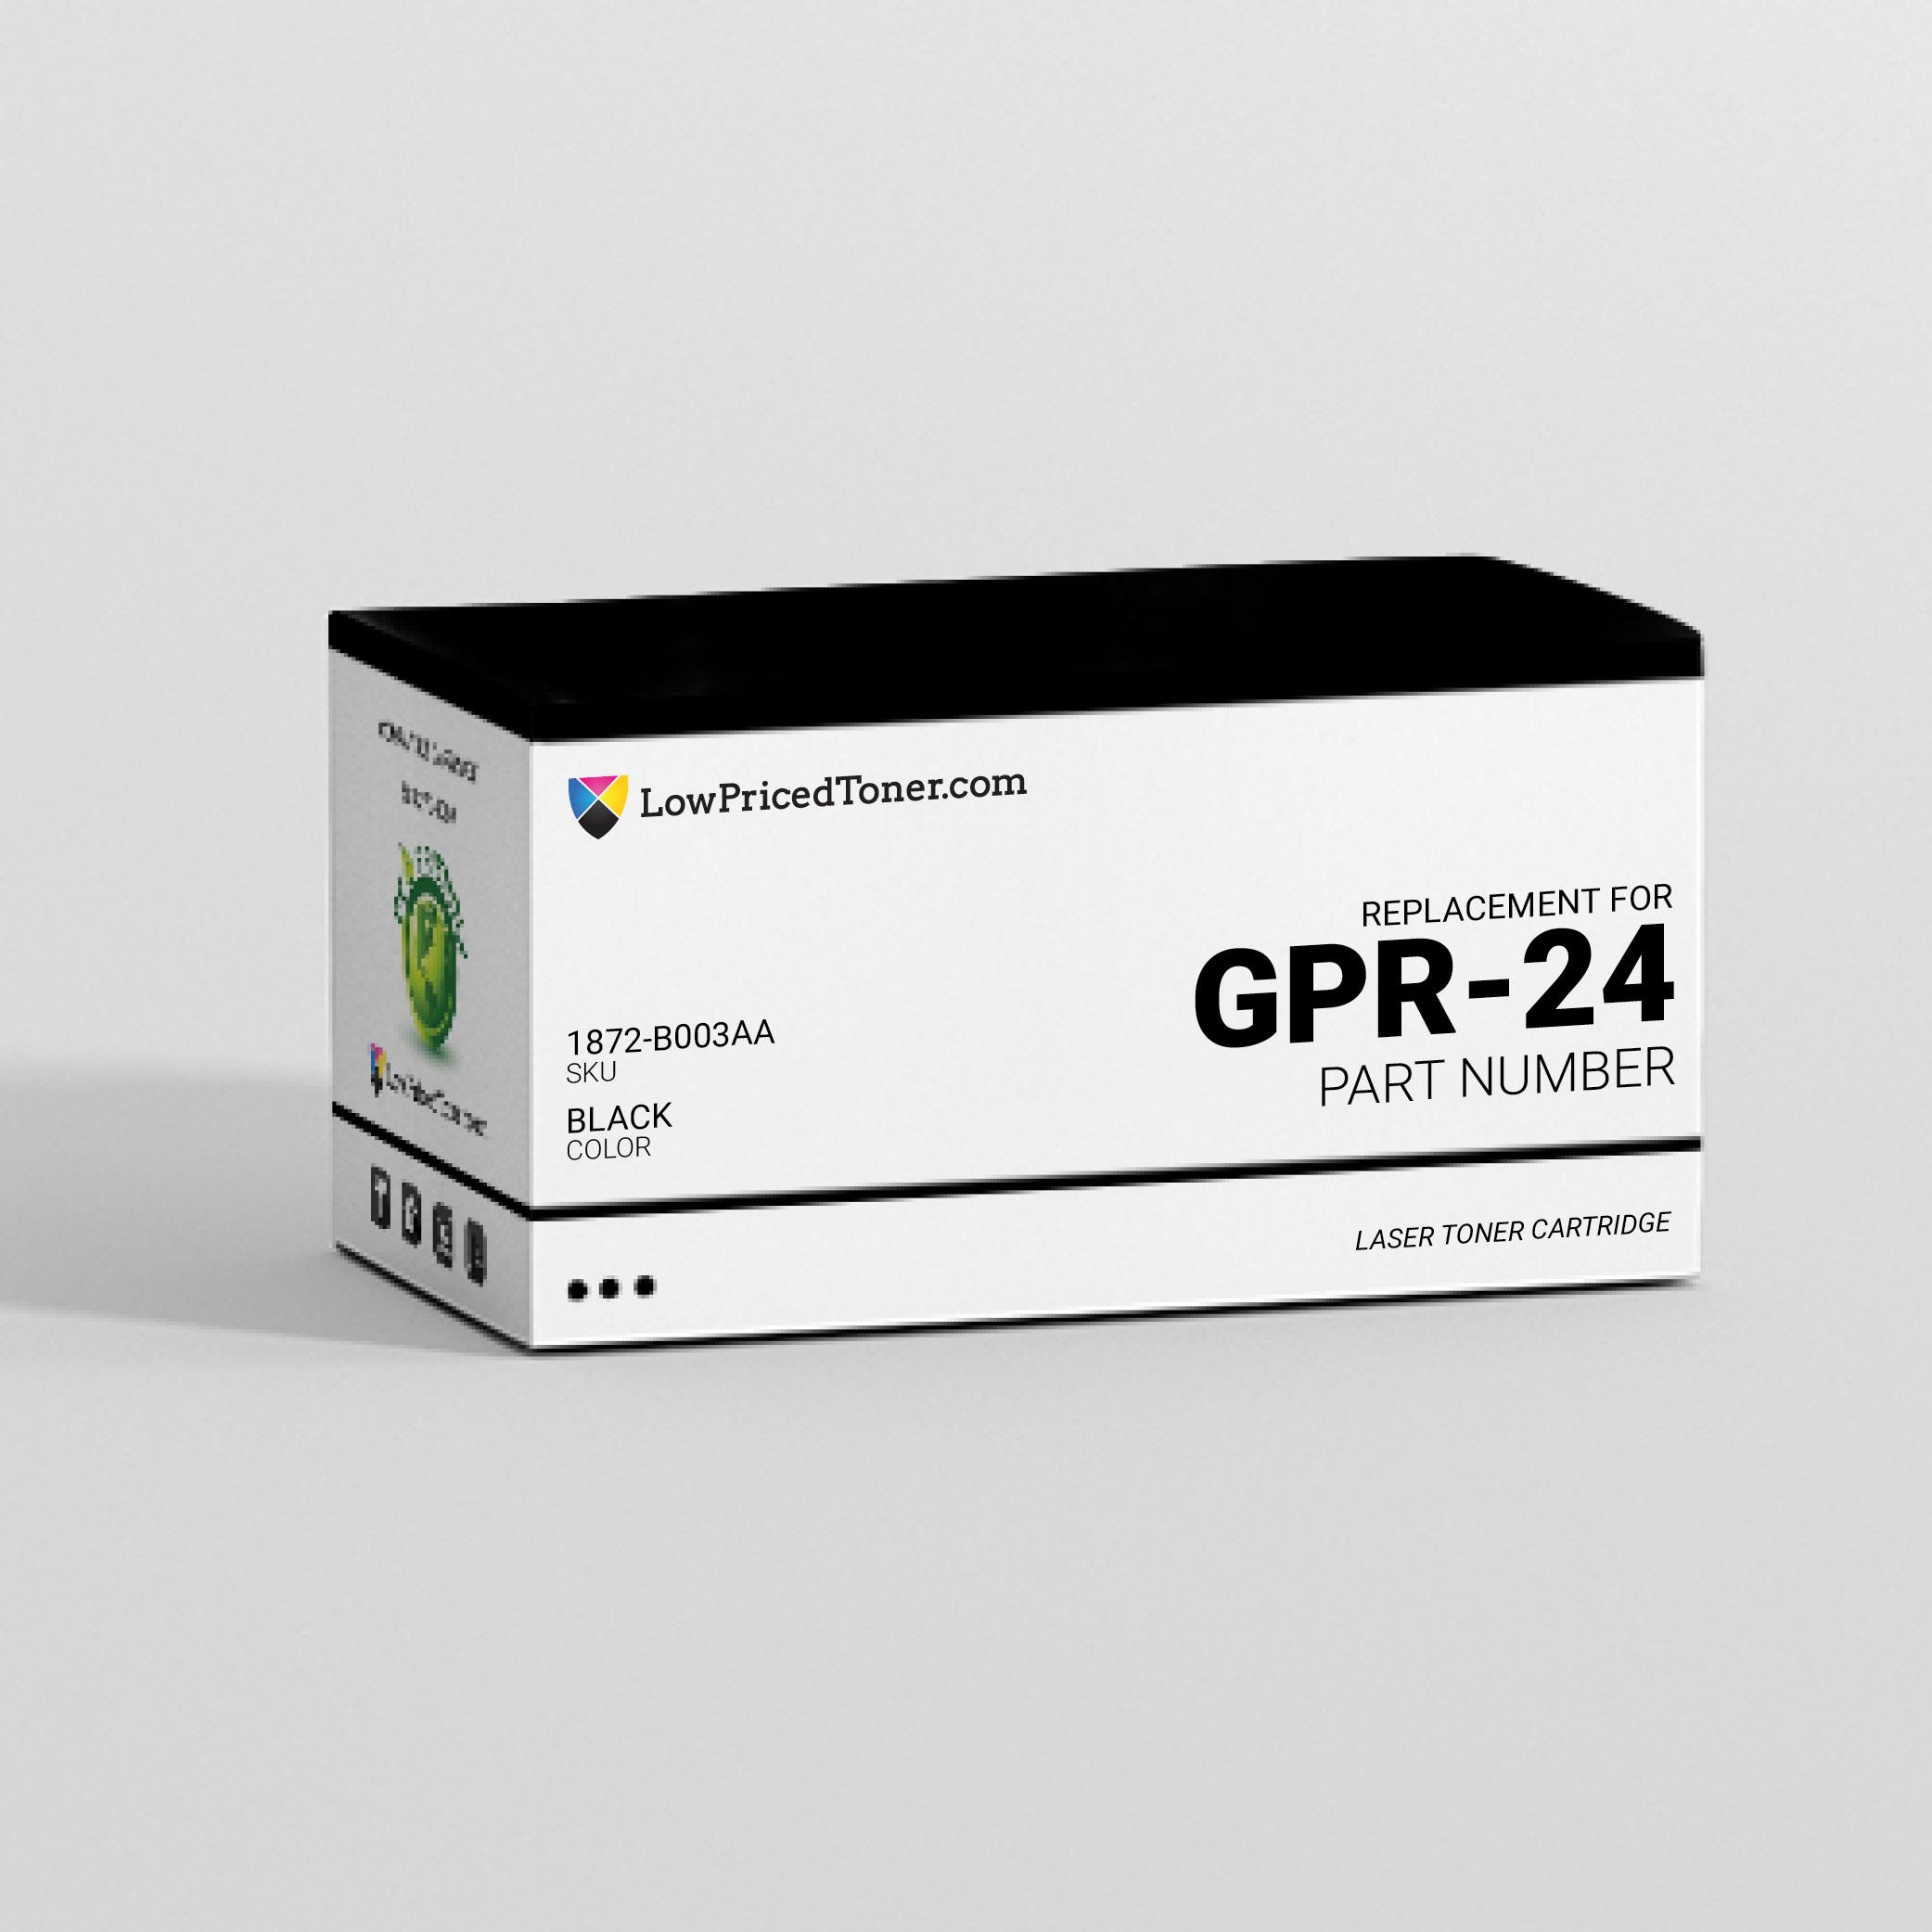 Canon 1872B003AA GPR-24 Compatible Black Laser Toner Cartridge